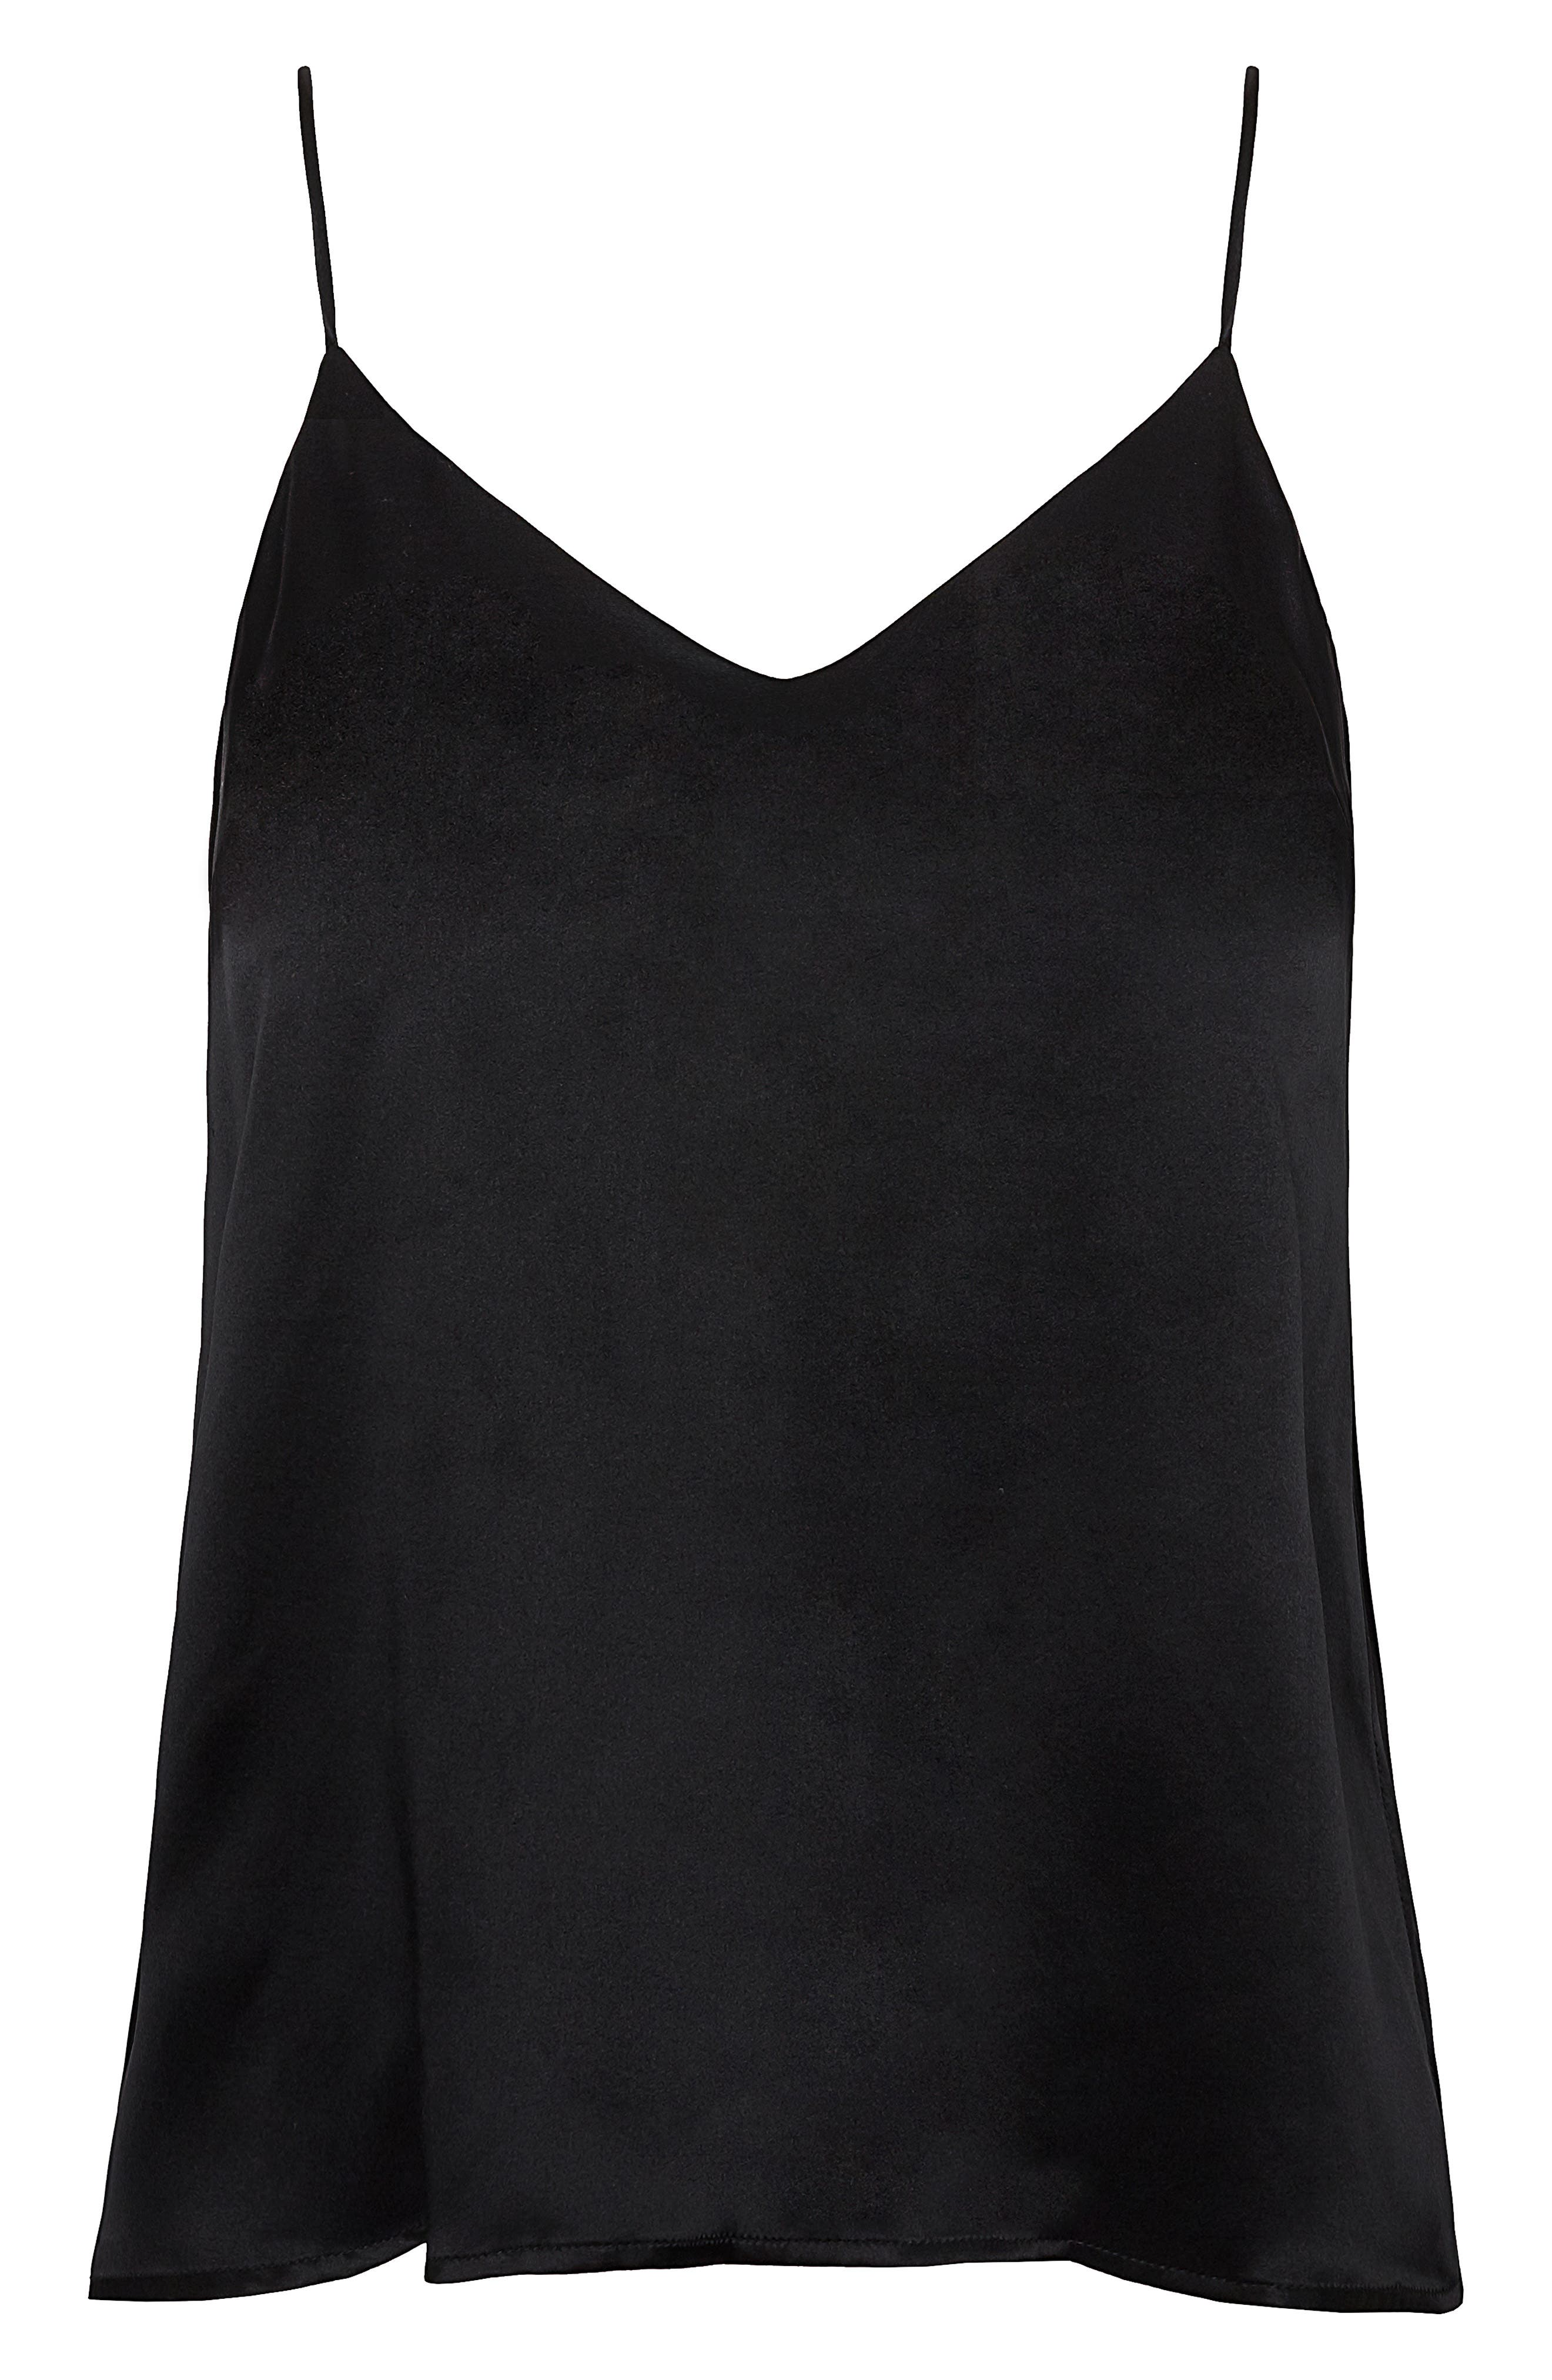 ANINE BING,                             Gwyneth Silk Satin Camisole,                             Alternate thumbnail 4, color,                             BLACK